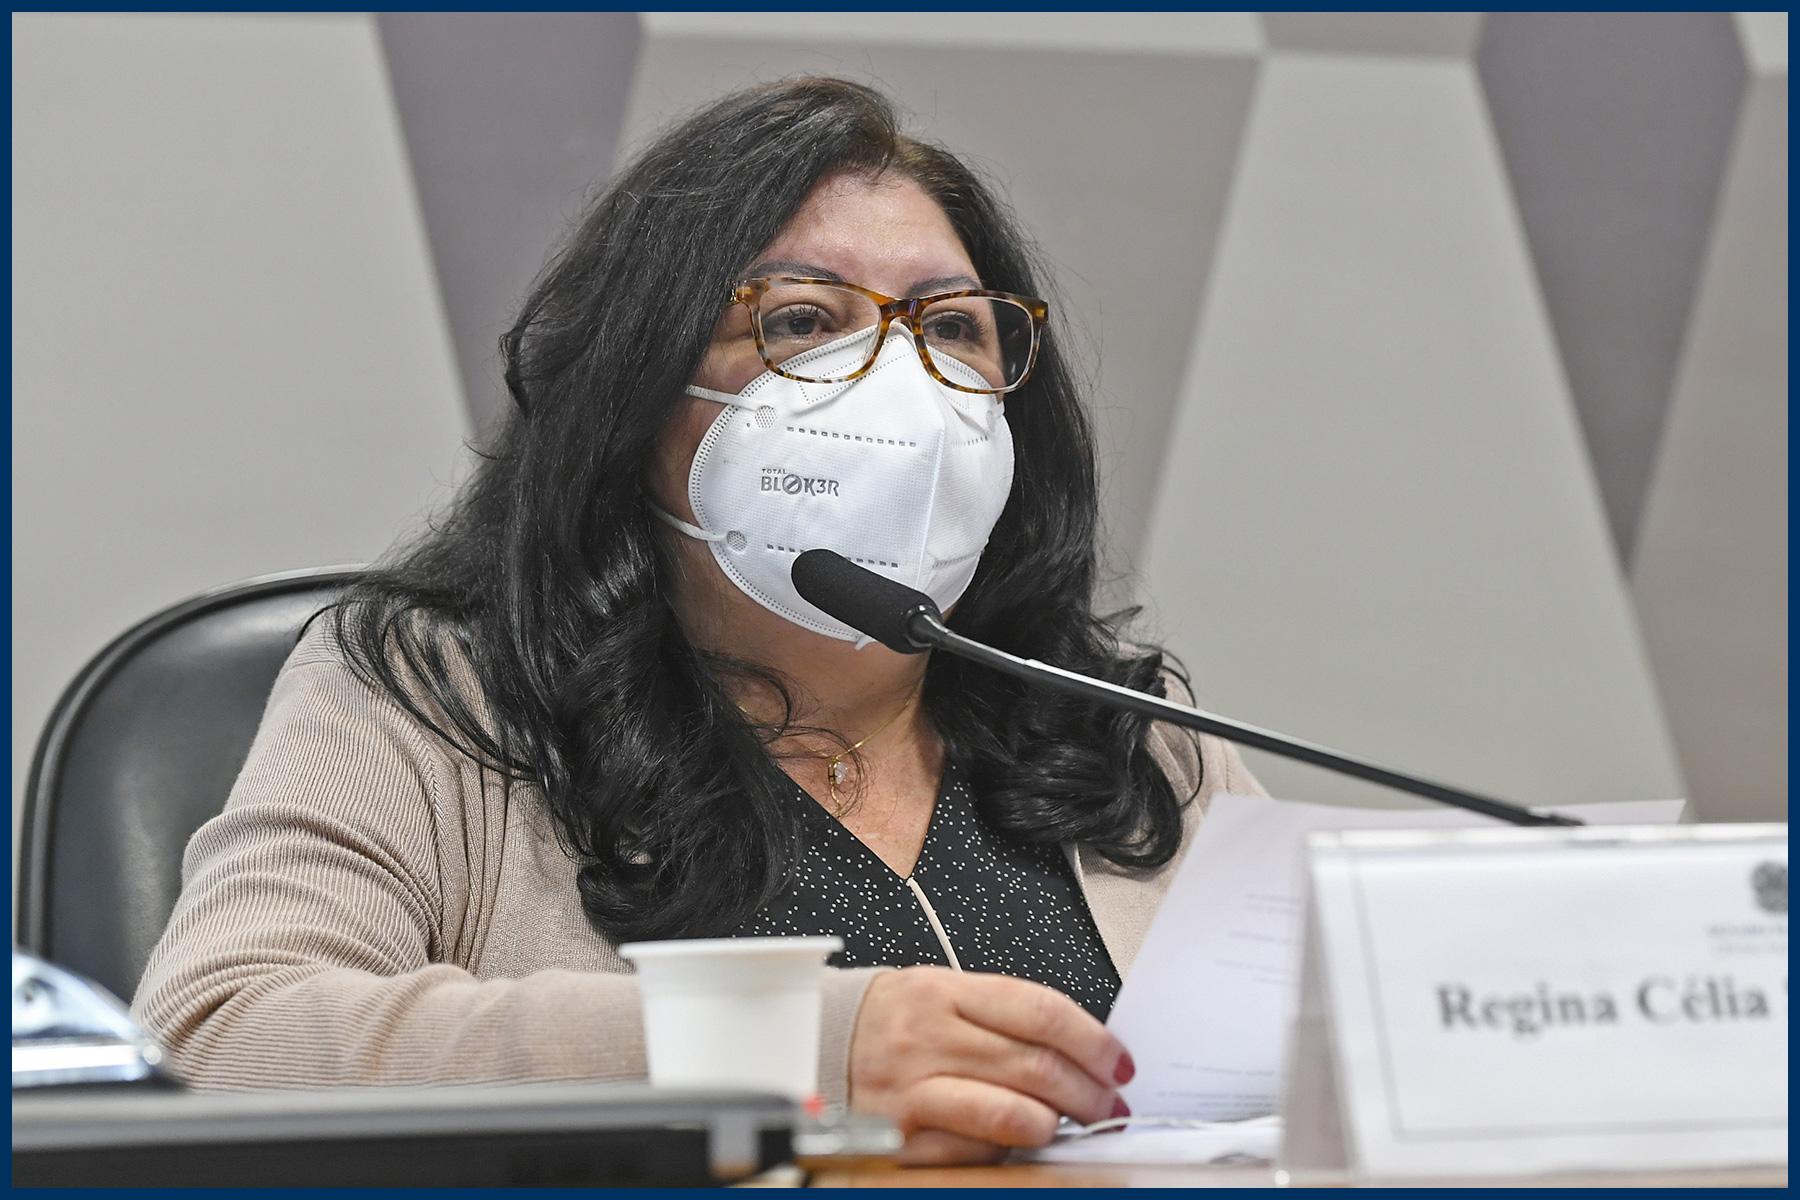 Regina Célia Silva Oliveira